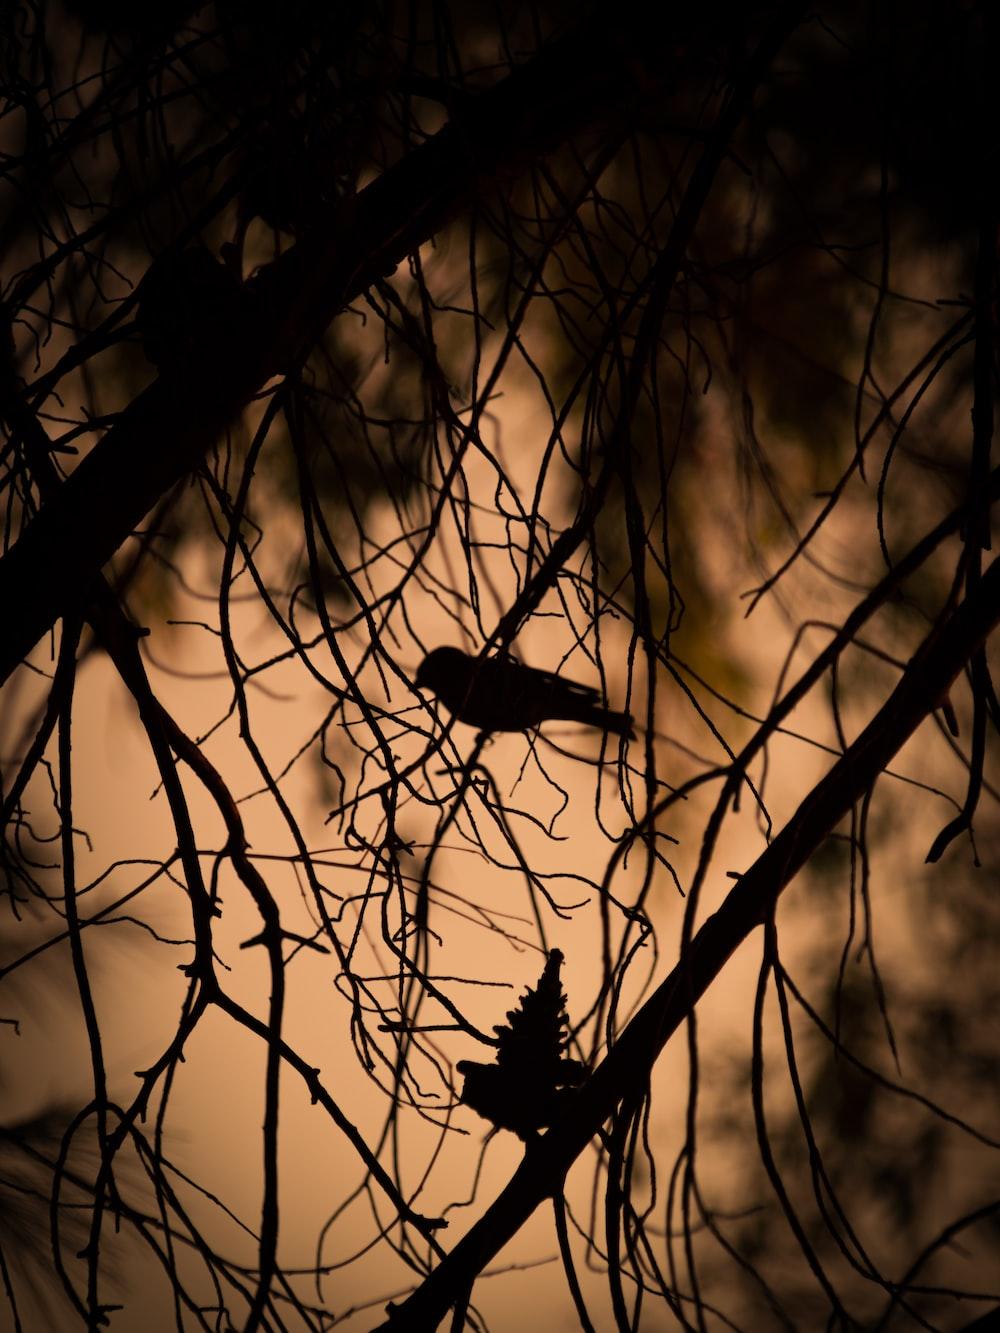 silhouette of bird on tree trunk